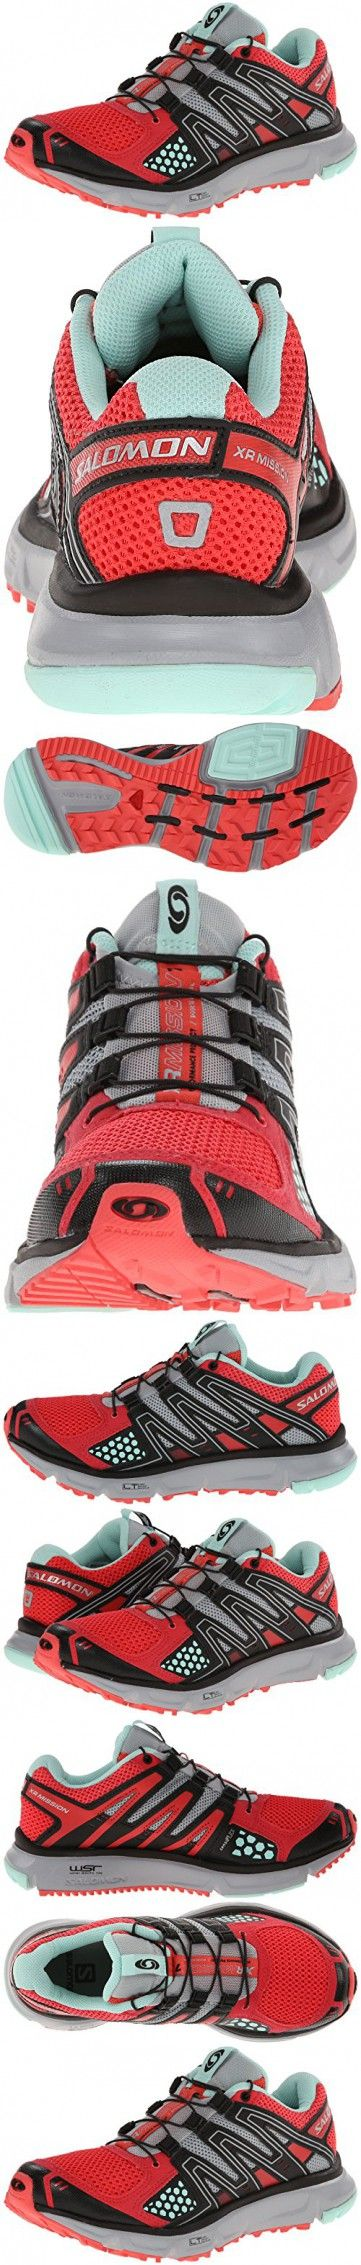 Salomon Women's XR Mission Trail Running Shoe, Papaya/Black/Igloo Blue, 6 M US